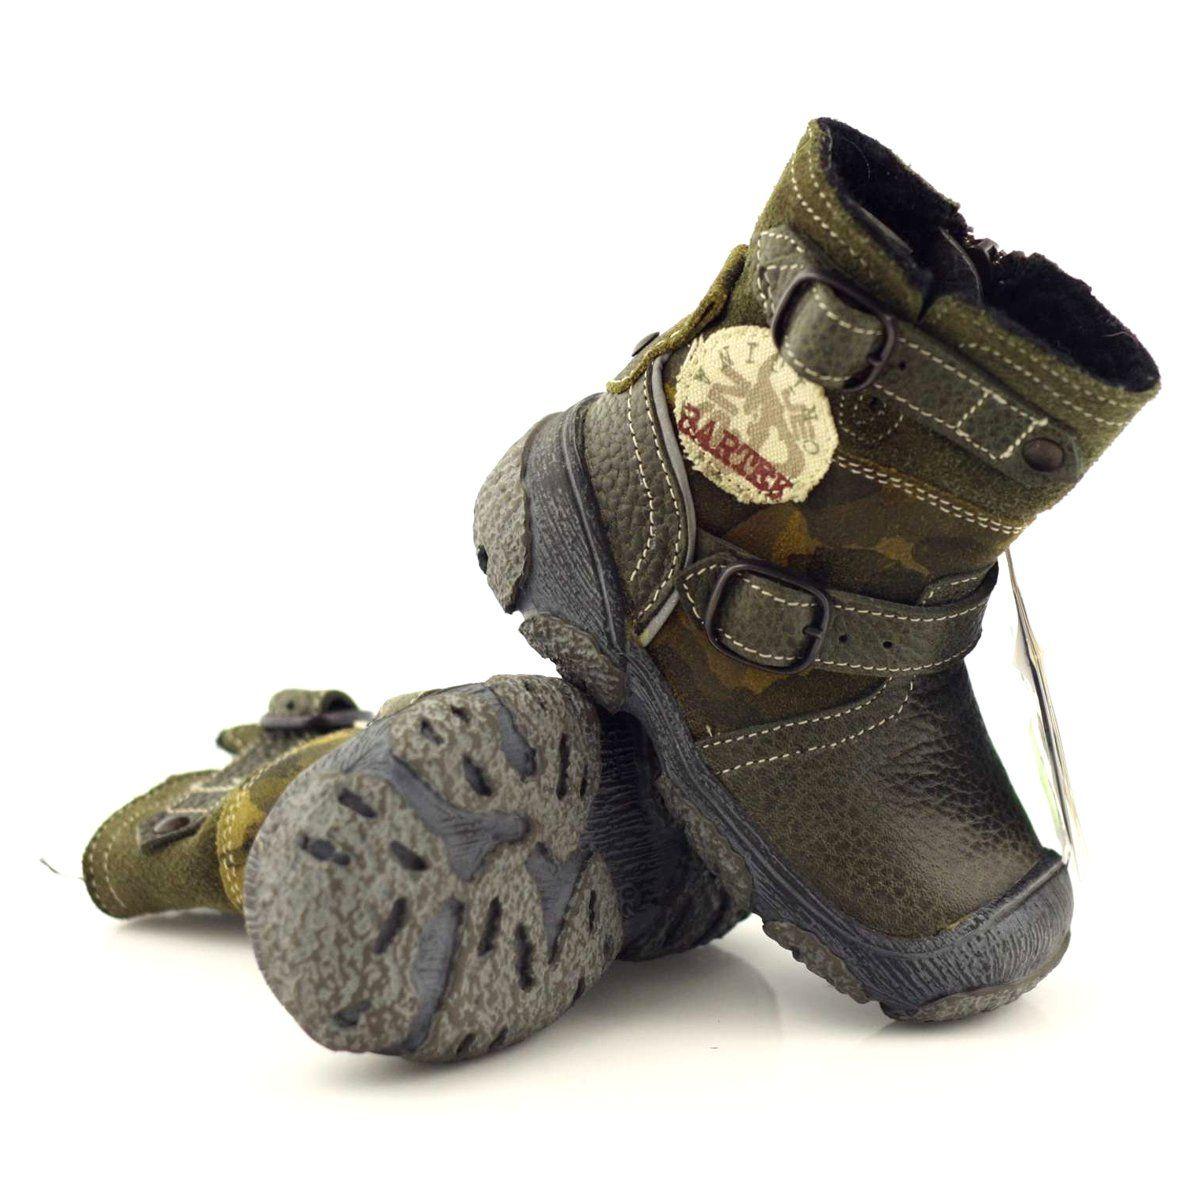 Kozaczki Buty Dzieciece Bartek 91543 Zielone Wielokolorowe Boots Warm Winter Boots Winter Boots